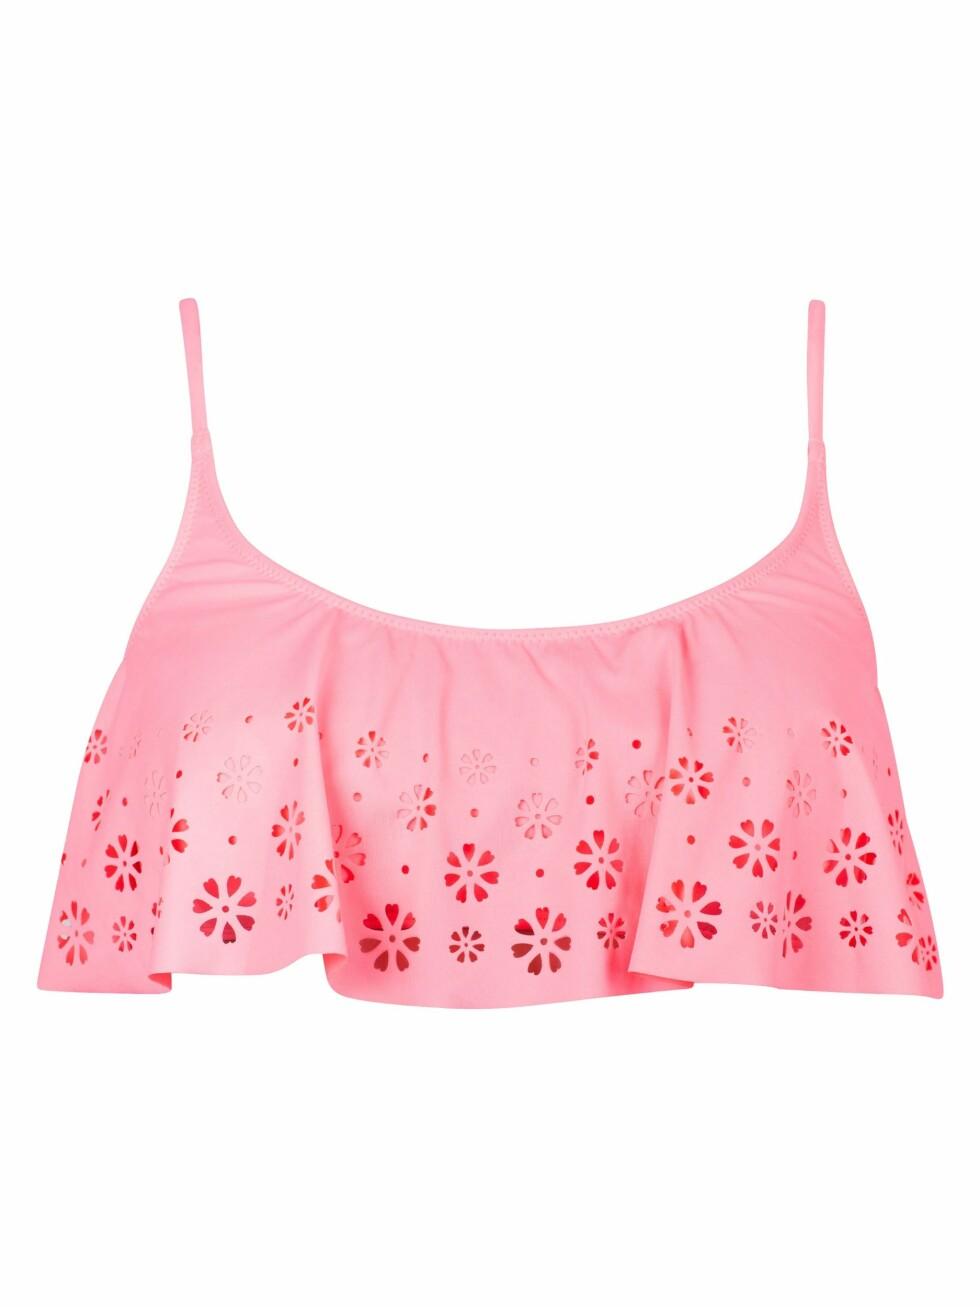 Rosa bikinitopp (kr 130, Cubus). Foto: Produsenten